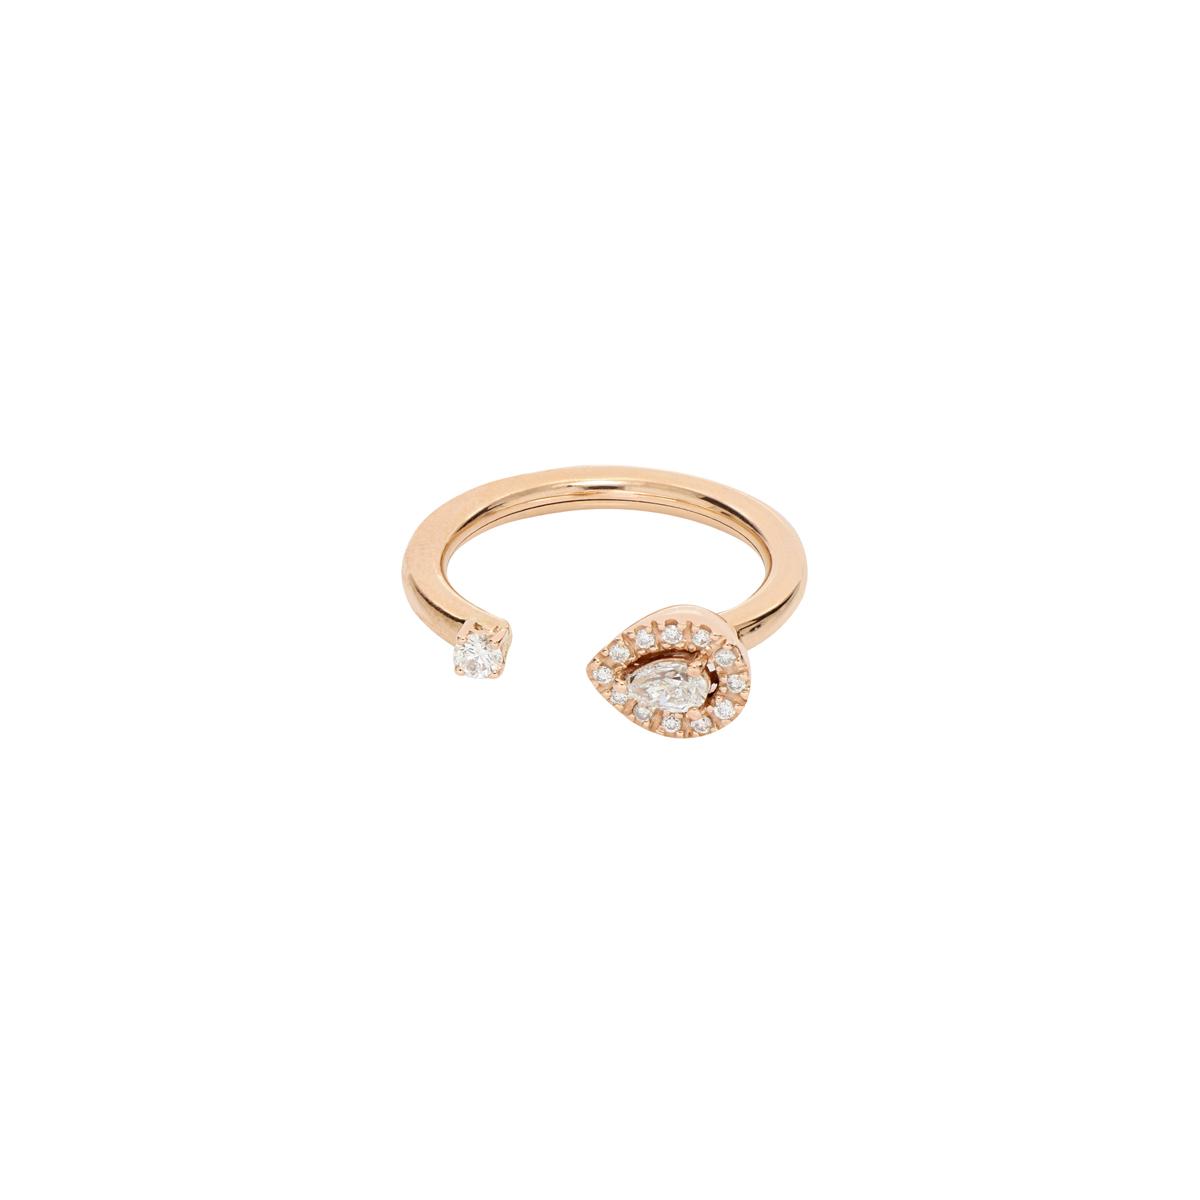 Open-Top Pear-Cut Diamond Ring